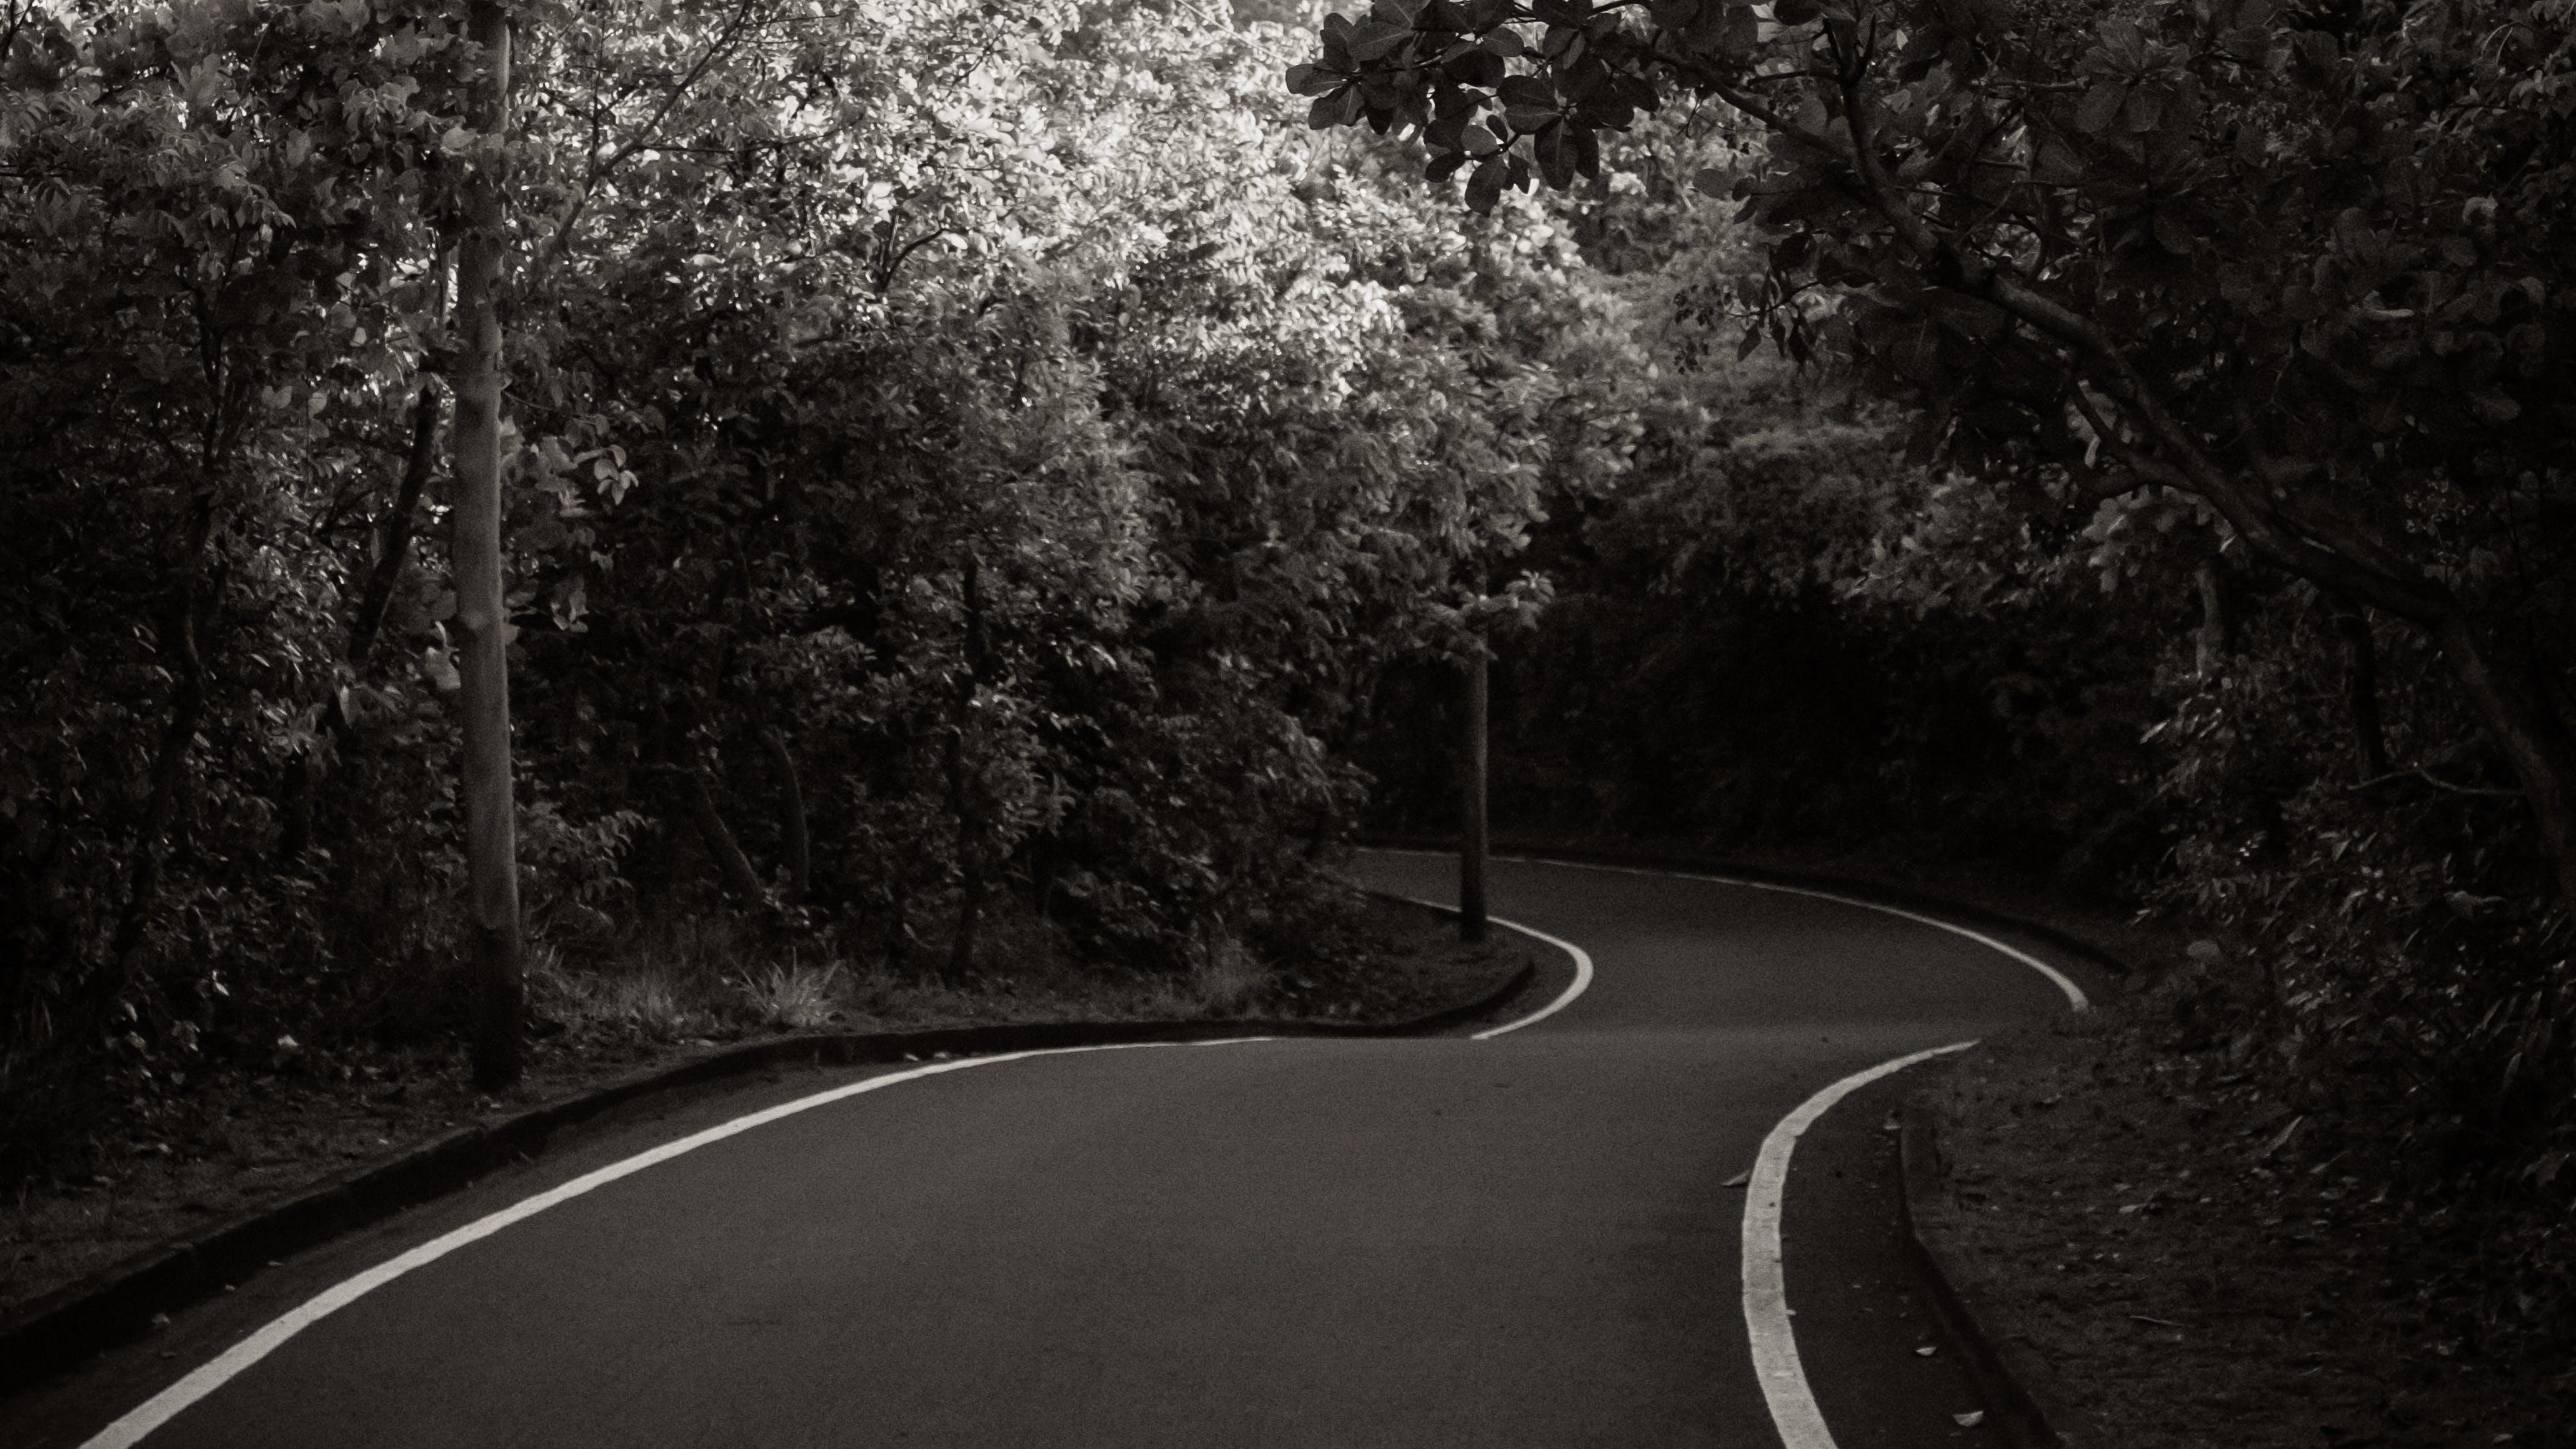 Free stock photo of autobahn, b&w, foot path, park